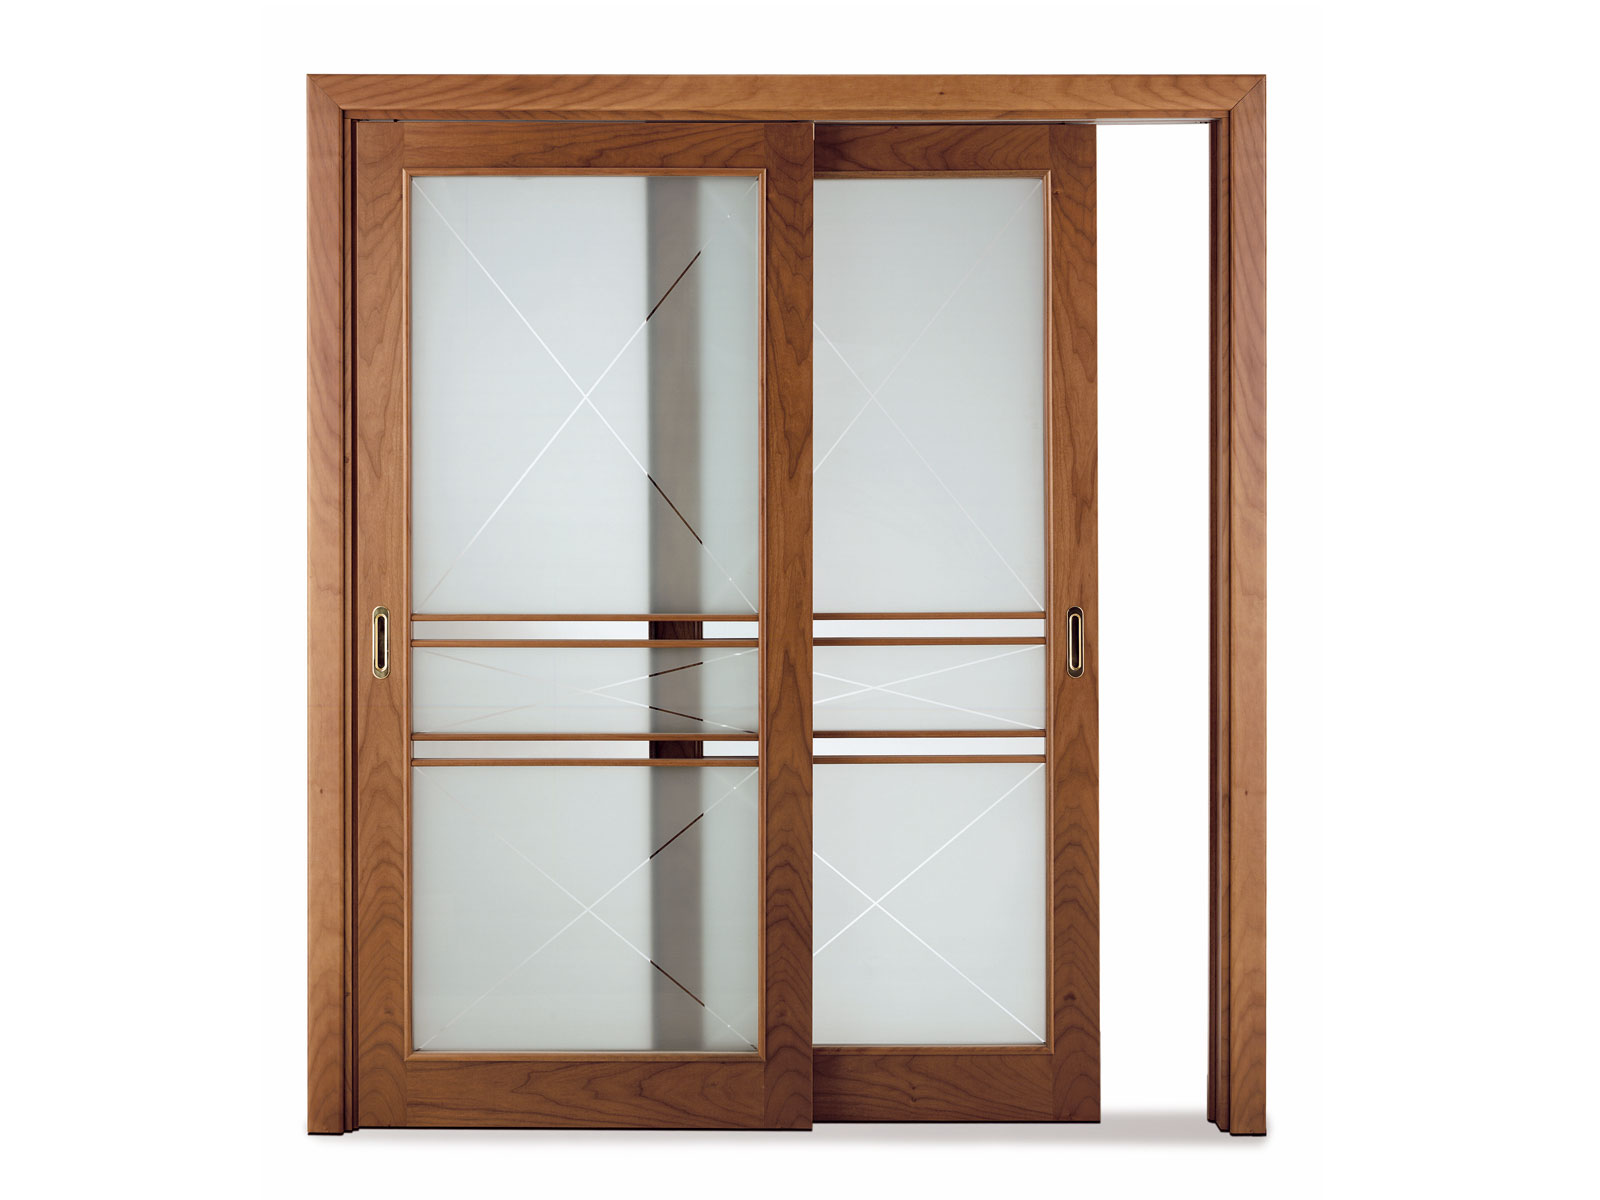 Puerta corrediza de vidrio dover by ghizzi benatti - Puerta corrediza madera ...